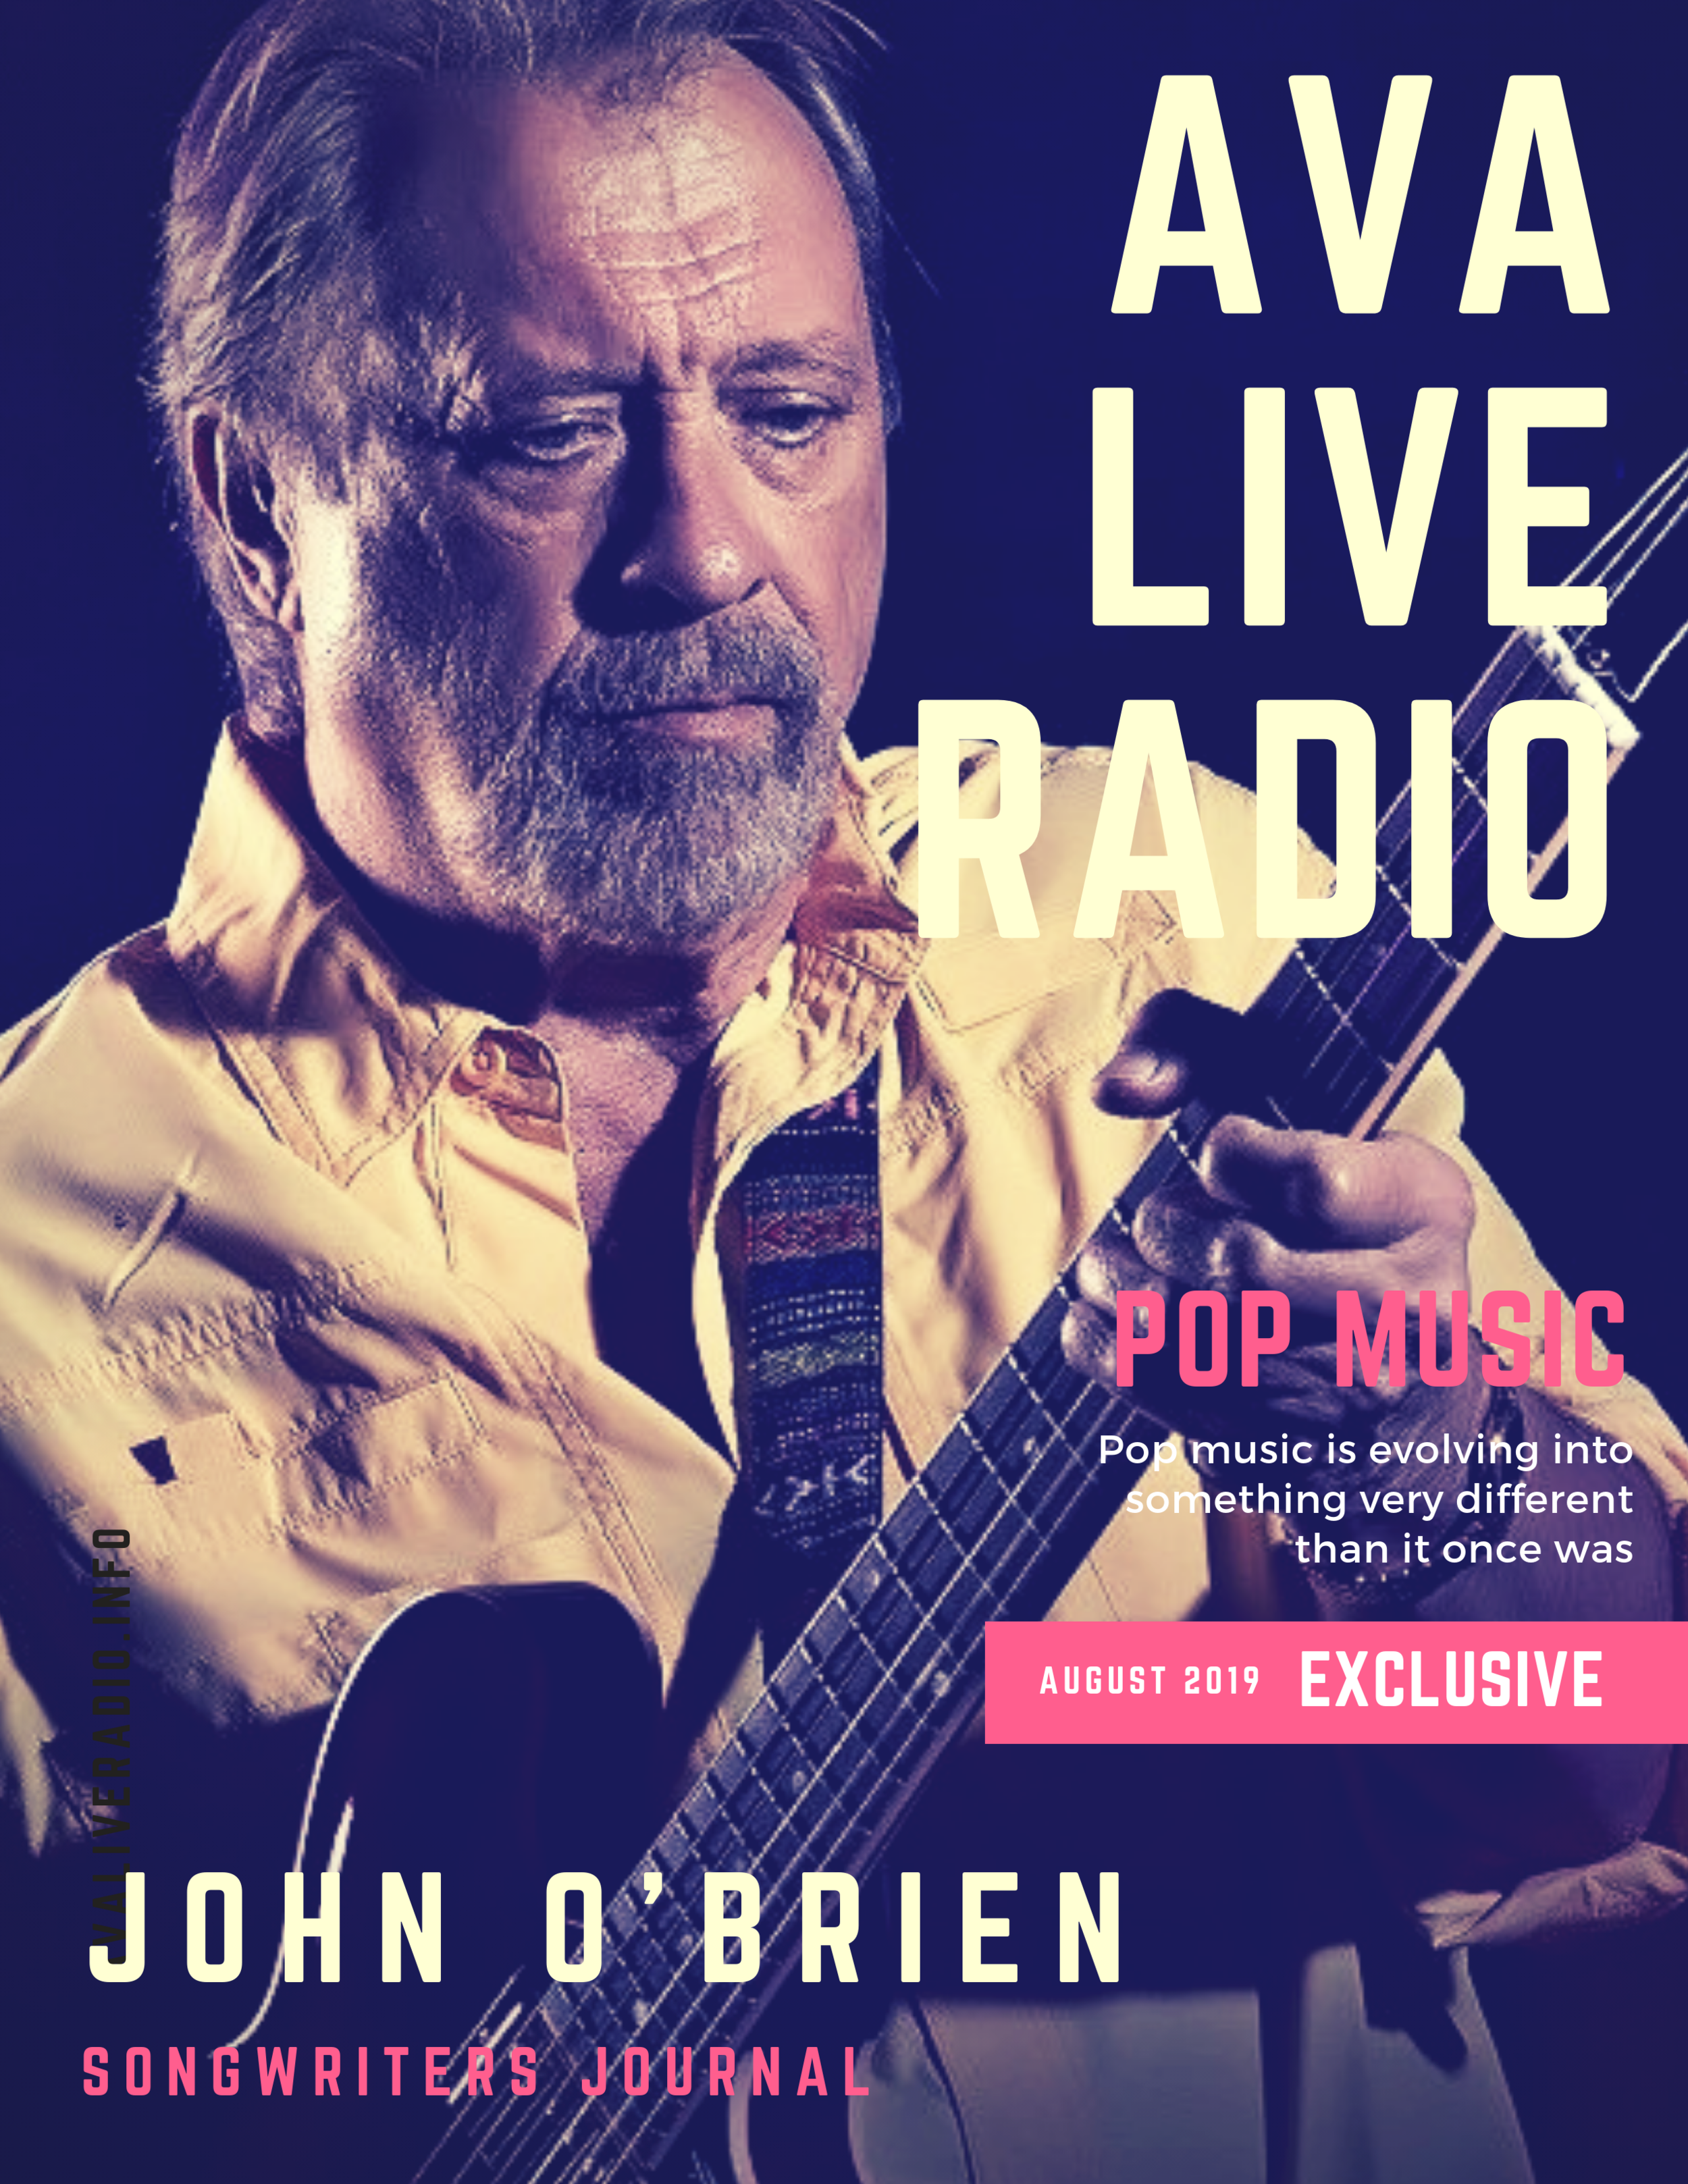 John Obrien AVA LIVE RADIO(3).pngJohn Obrien Behind the Music AVA LIVE RADIO(3).png